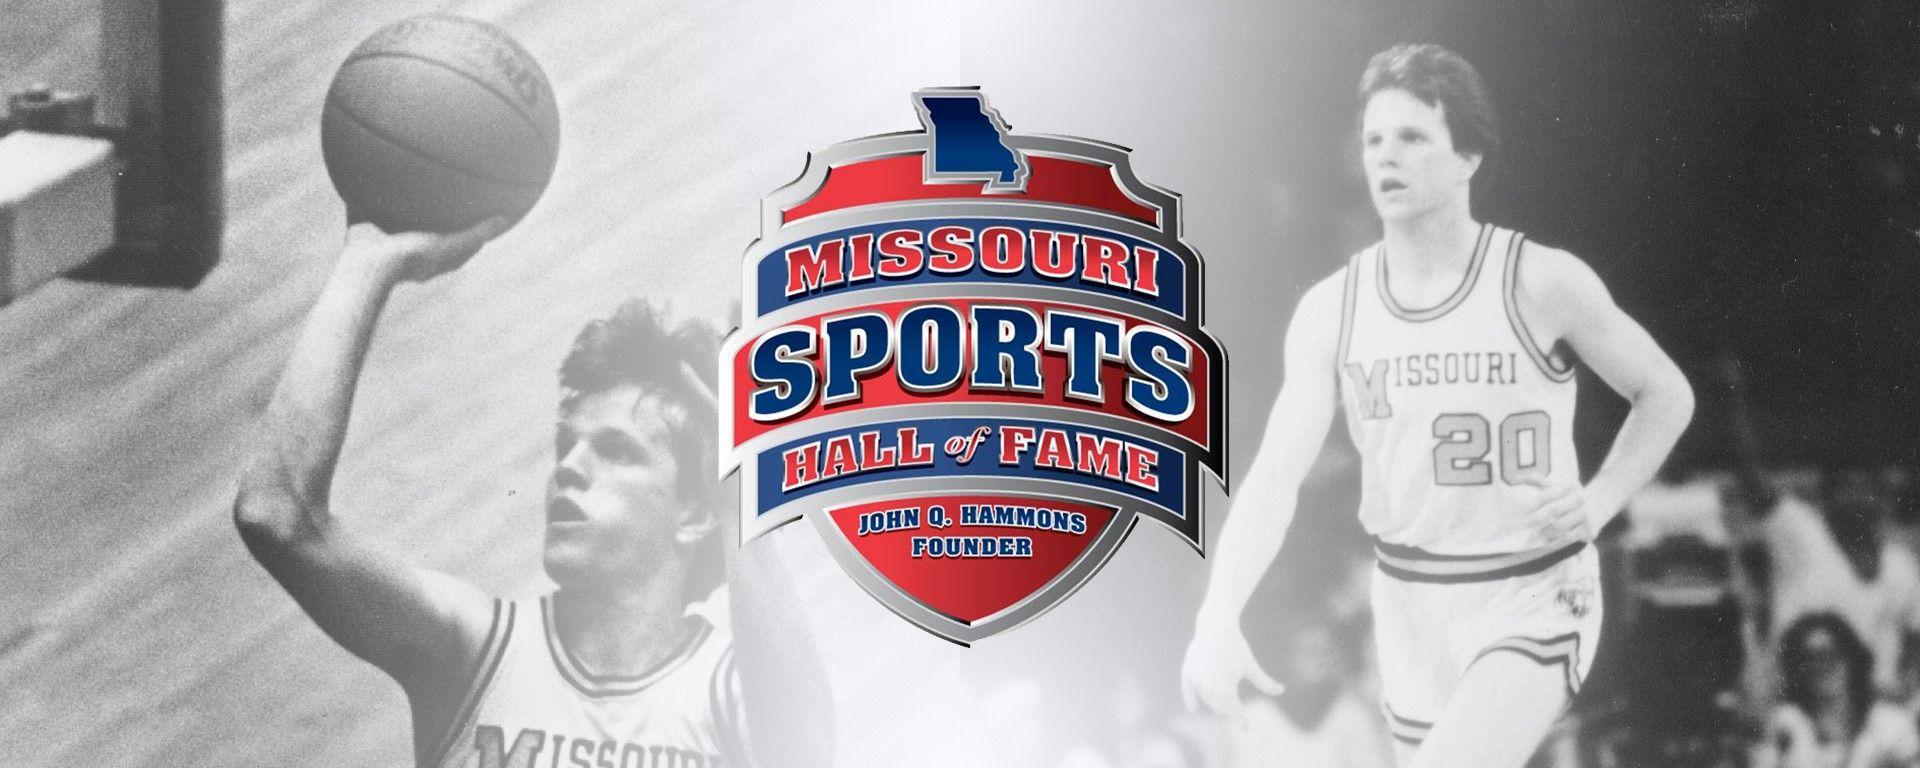 Missouri Sports Hall of Fame to Honor ' Sundvold Sport